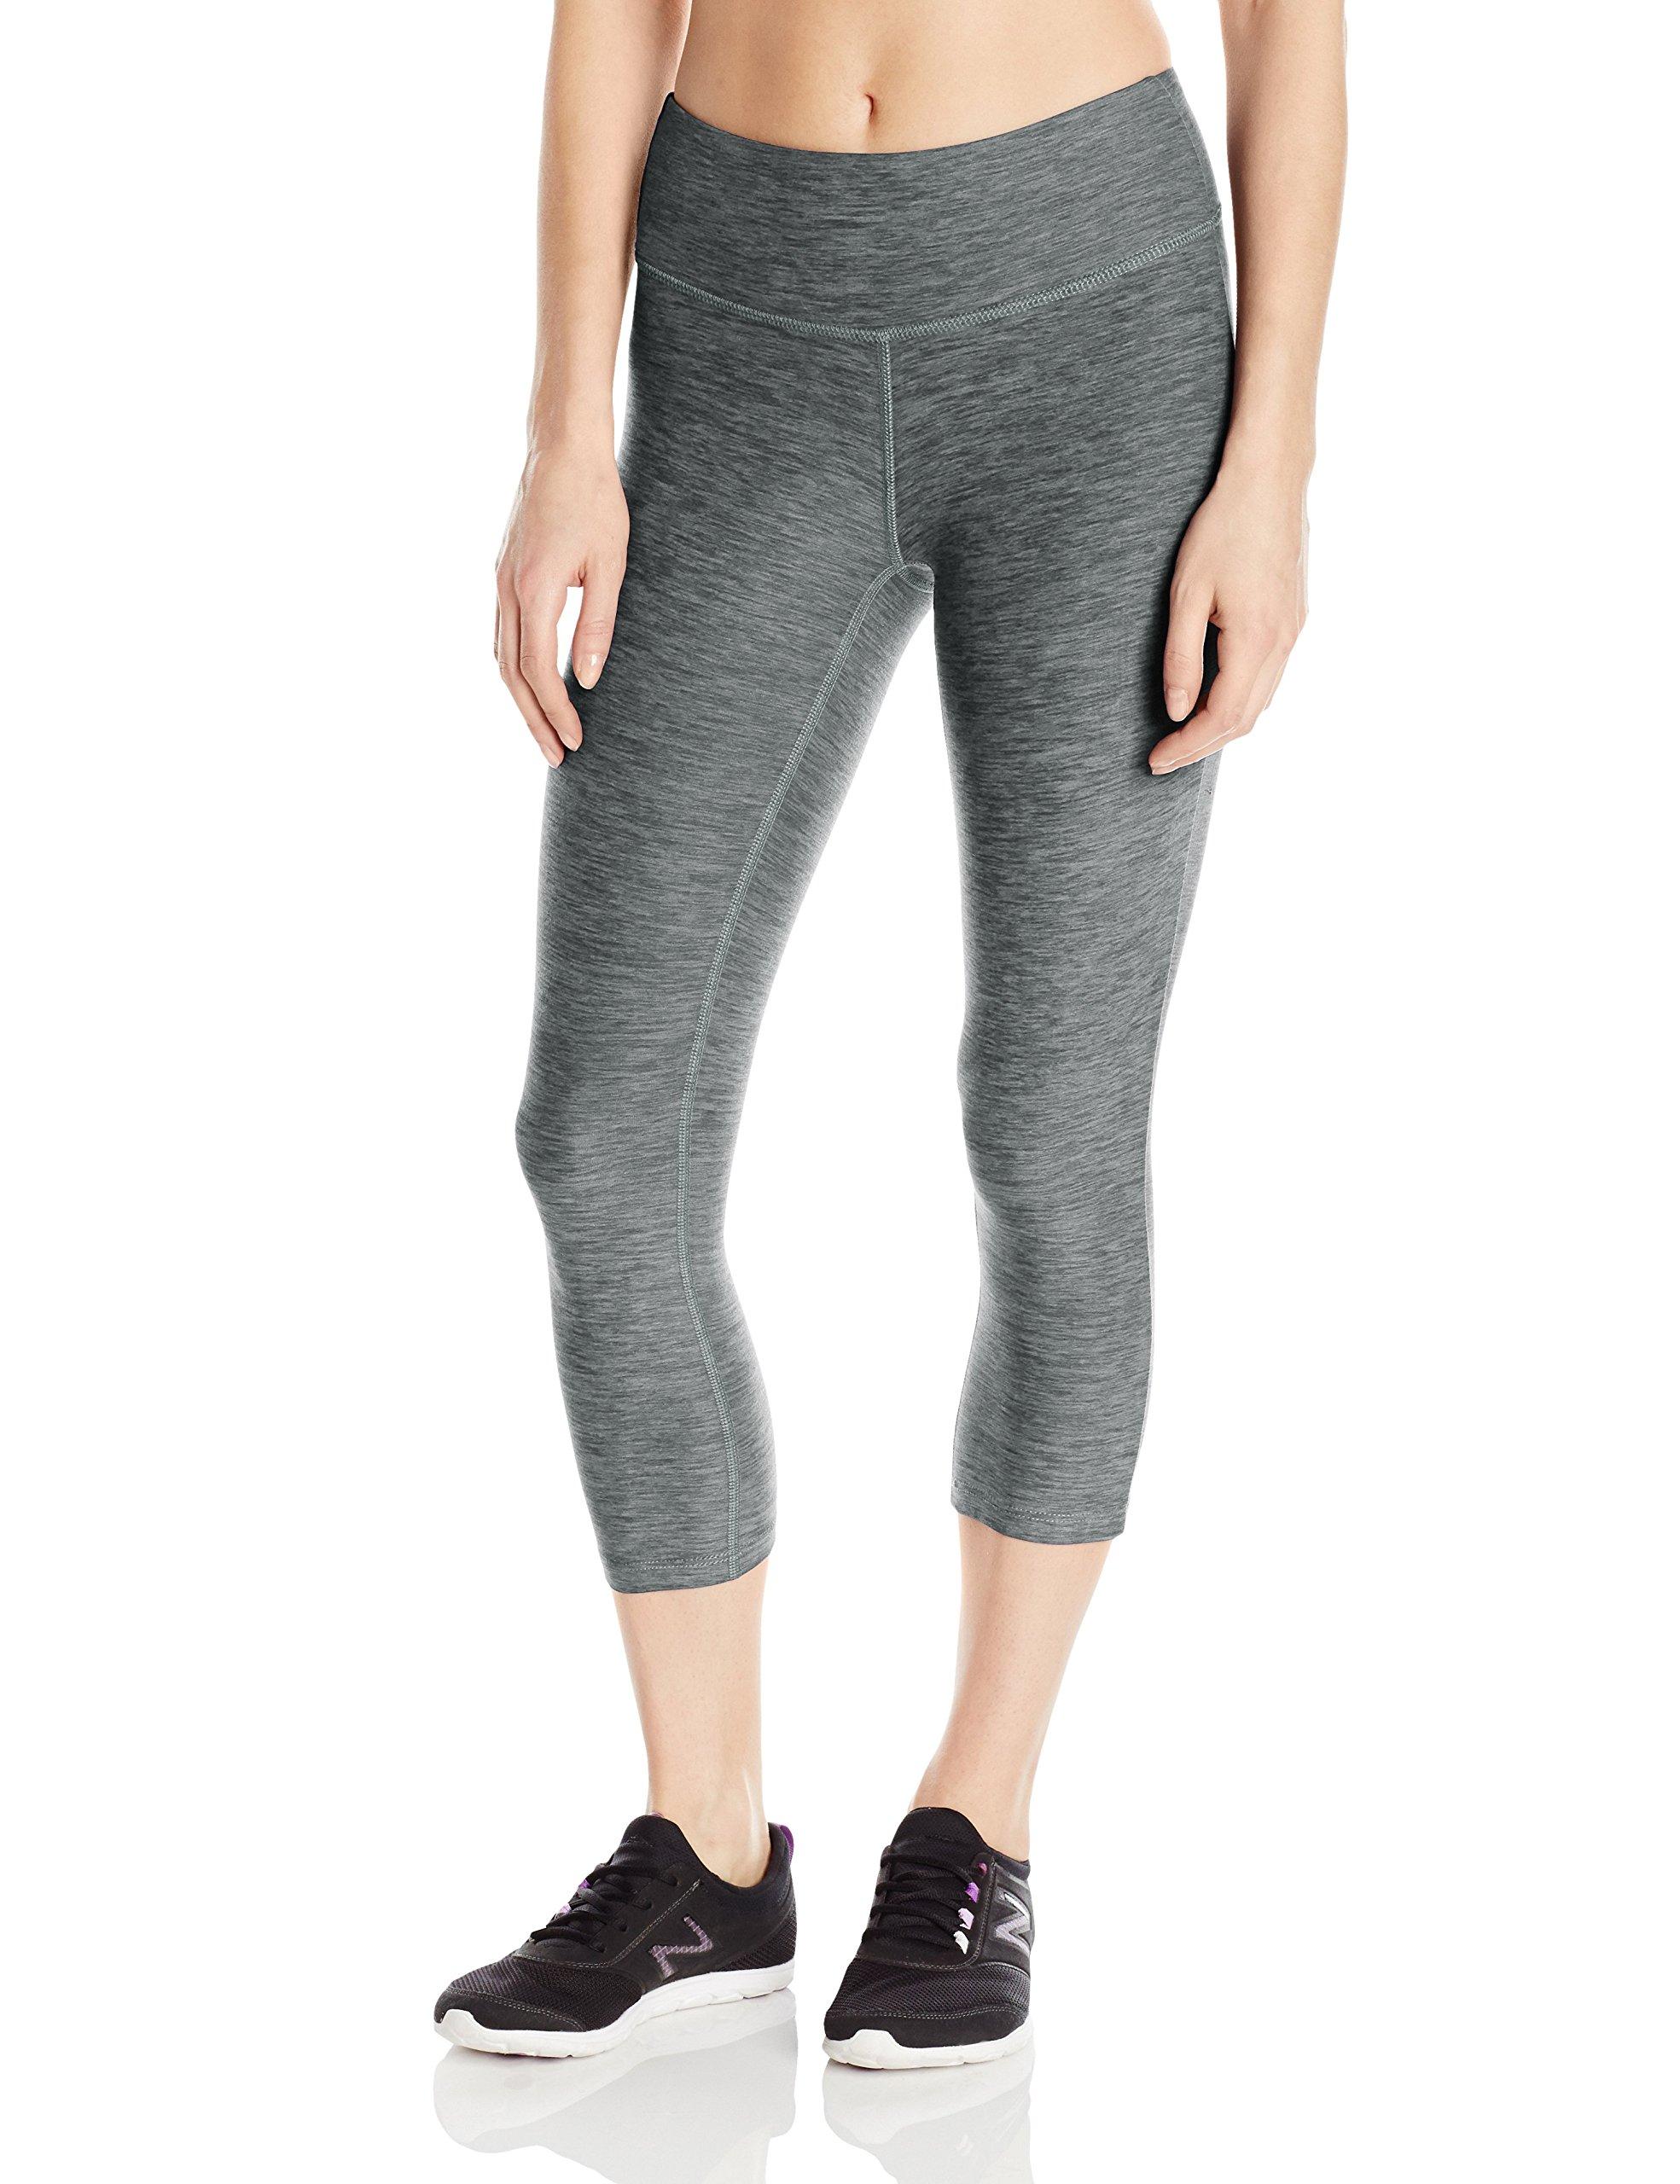 68e47d00e8f5f Best Rated in Women s Sports Capri Pants   Helpful Customer Reviews ...